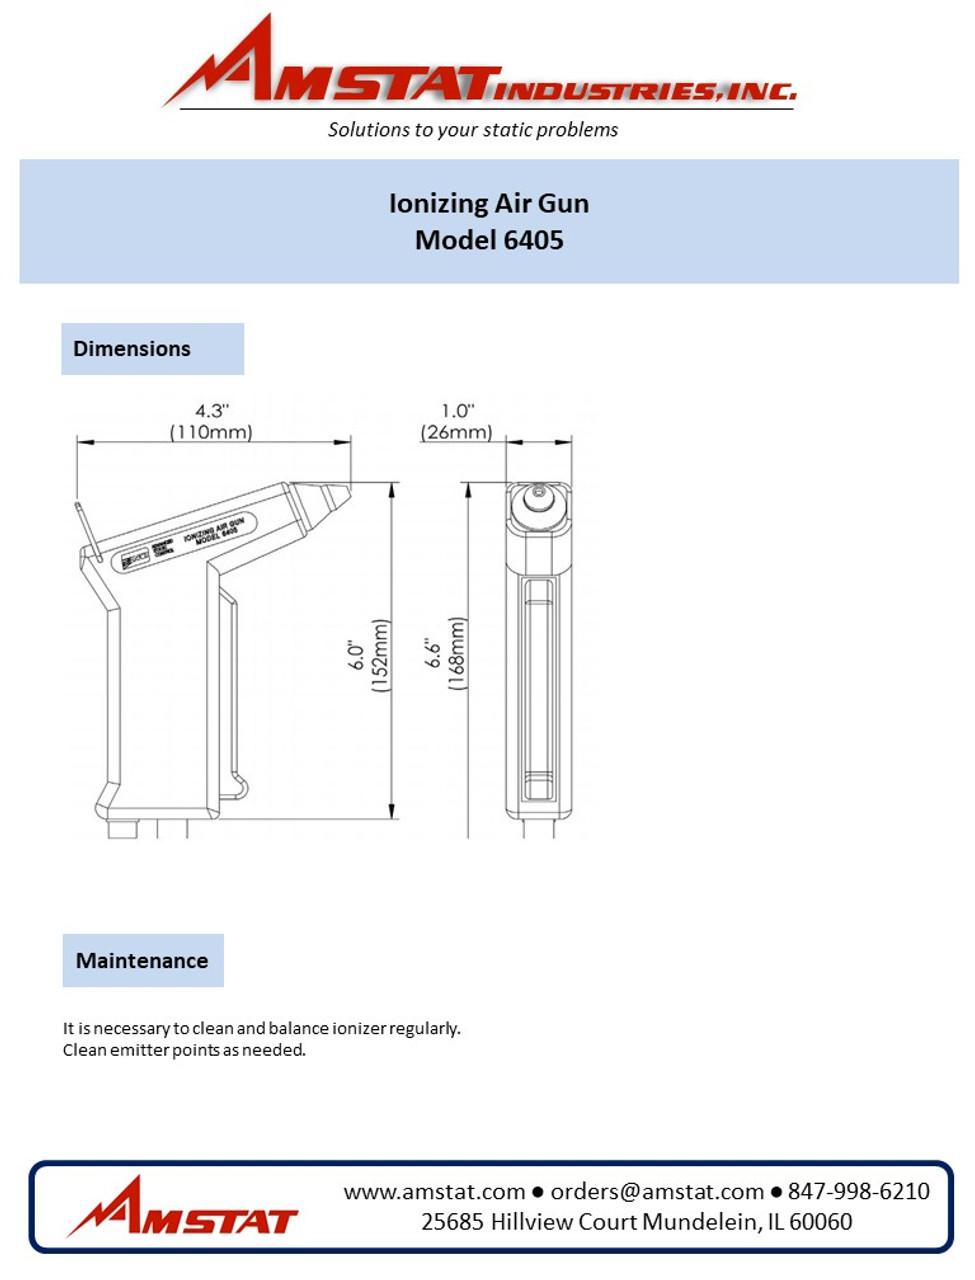 Electrical Handheld Air Ionizer